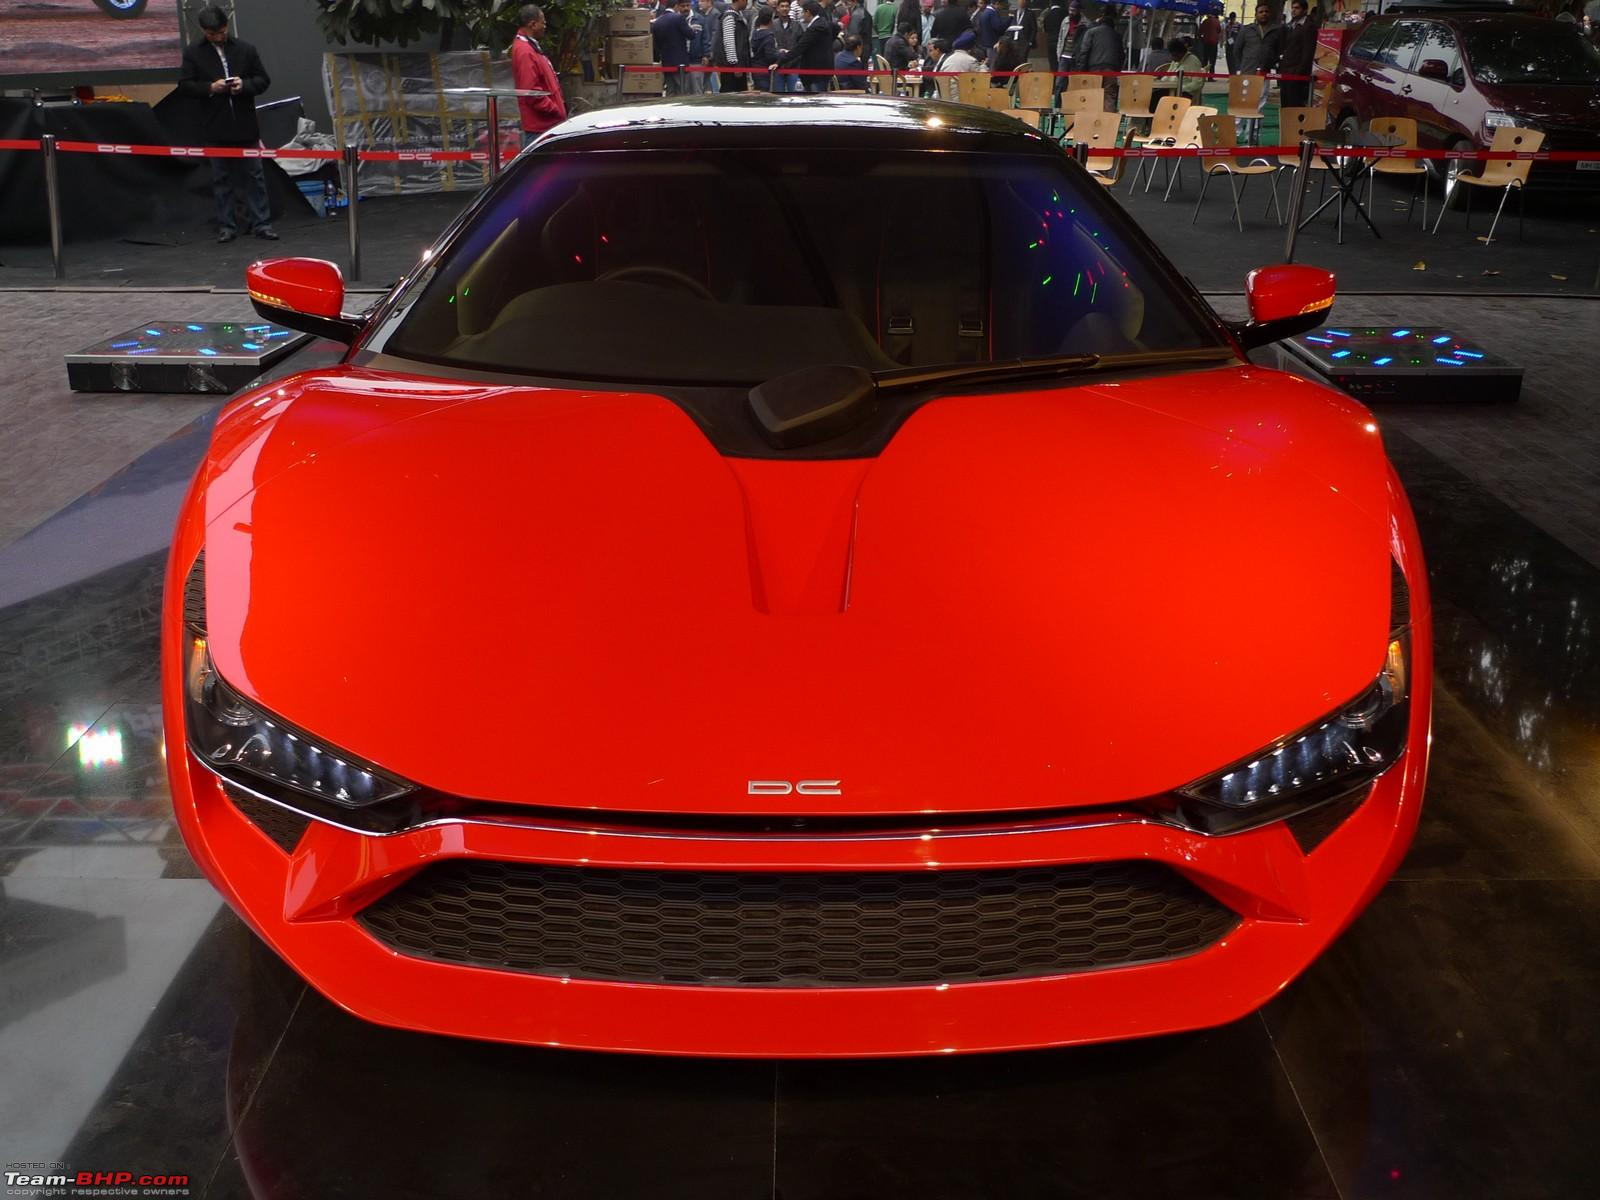 the dc avanti sports car auto expo 2012 edit now. Black Bedroom Furniture Sets. Home Design Ideas